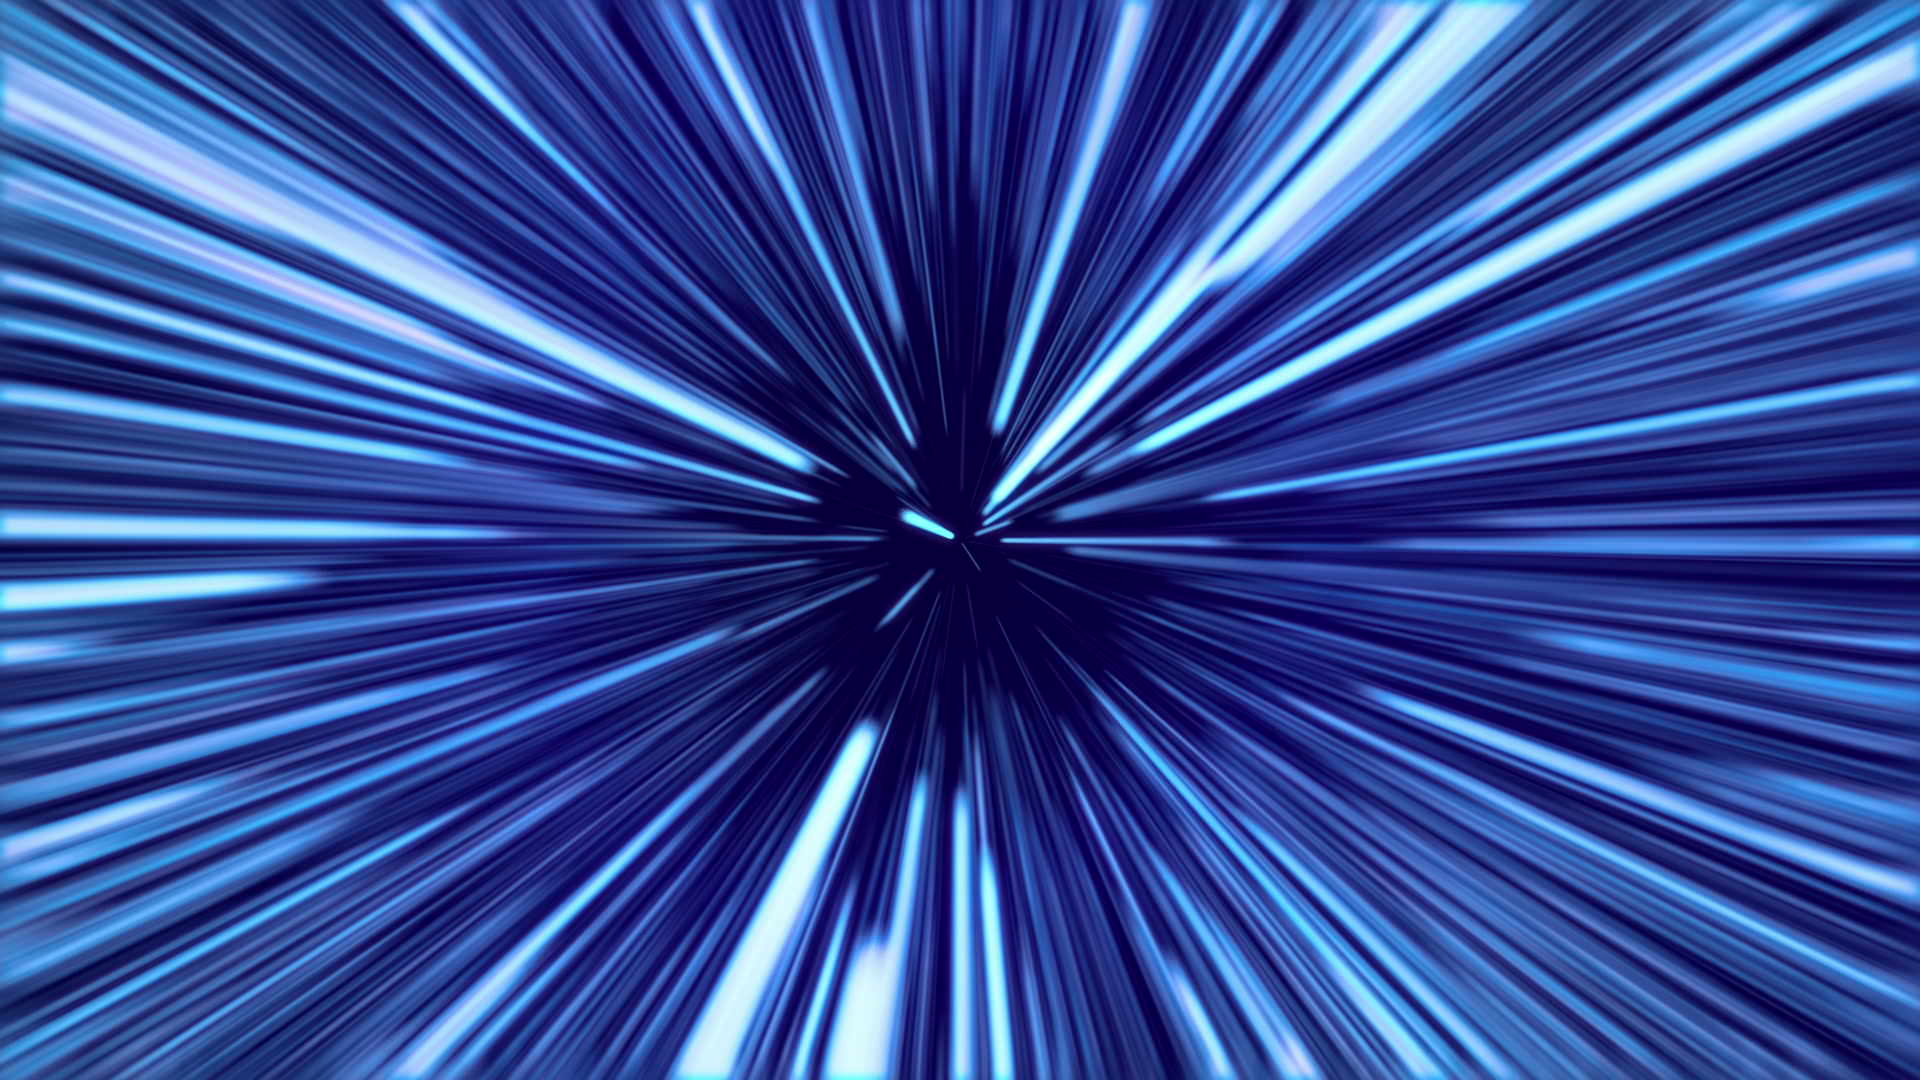 3d Effect Live Wallpapers Travel At Light Speed Blue Wpfaster